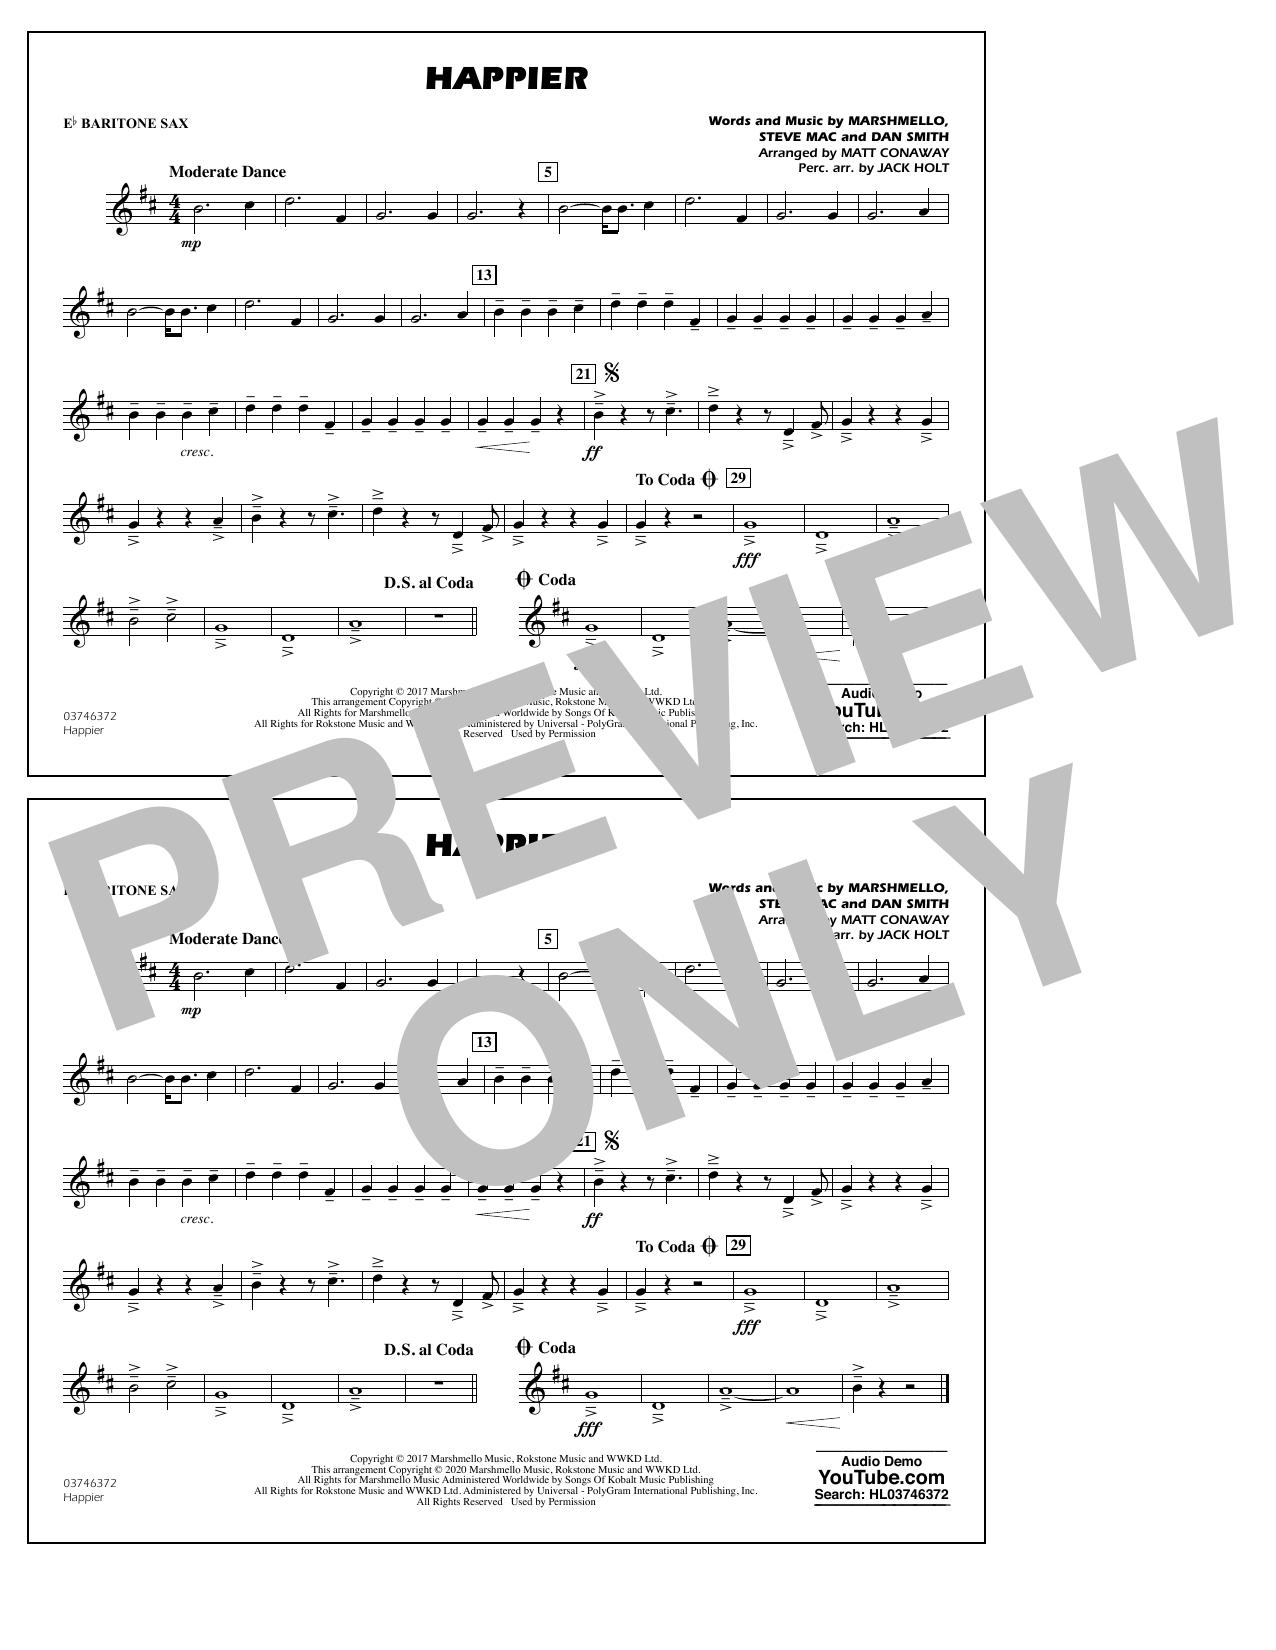 Happier (arr. Matt Conaway and Jack Holt) - Eb Baritone Sax Sheet Music